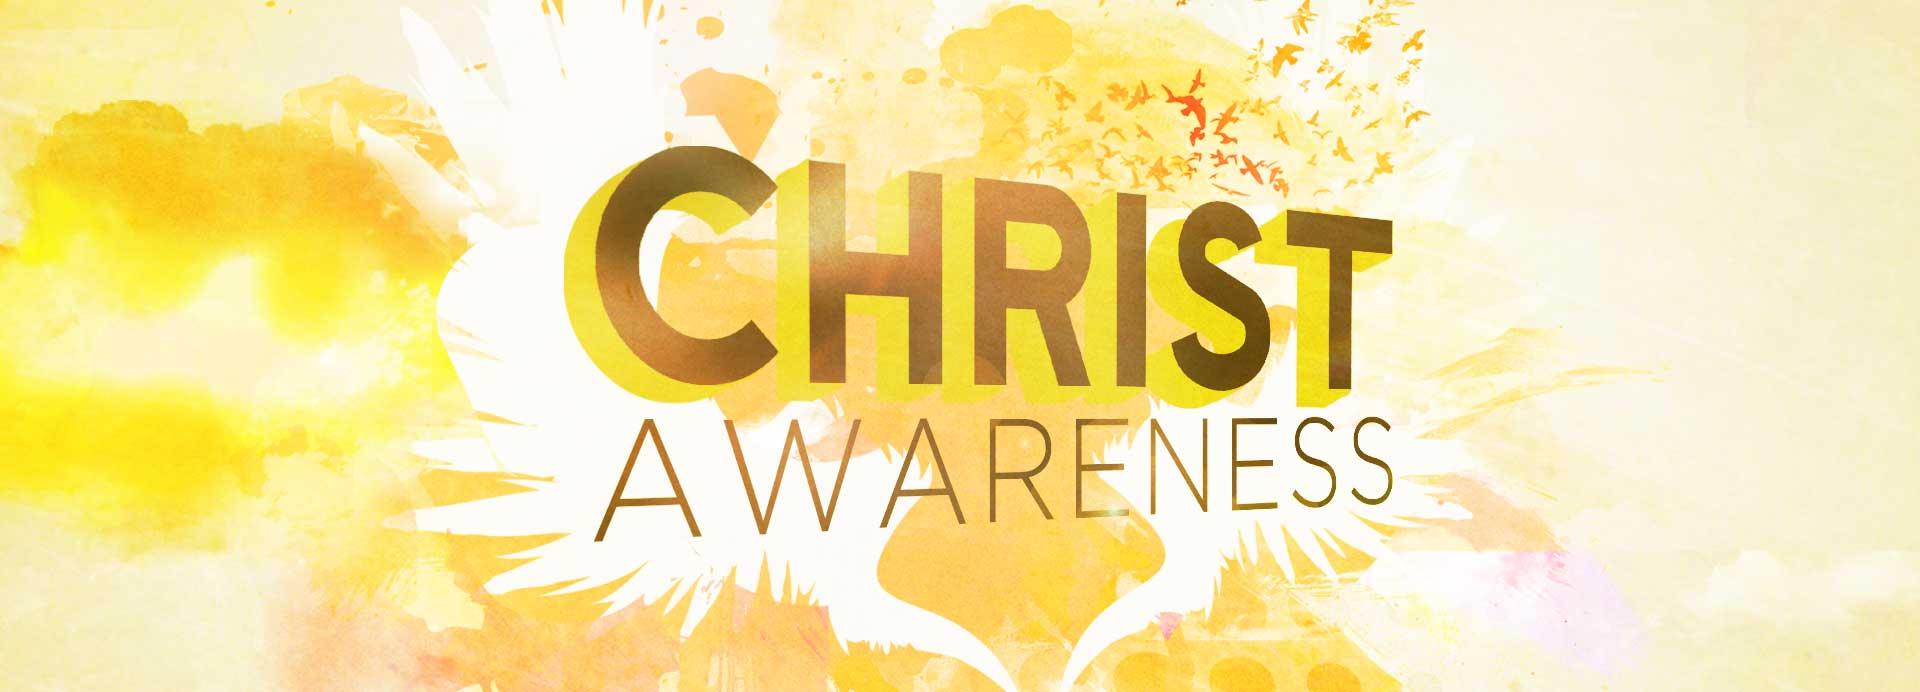 ChristAwareness_1920x692.jpg